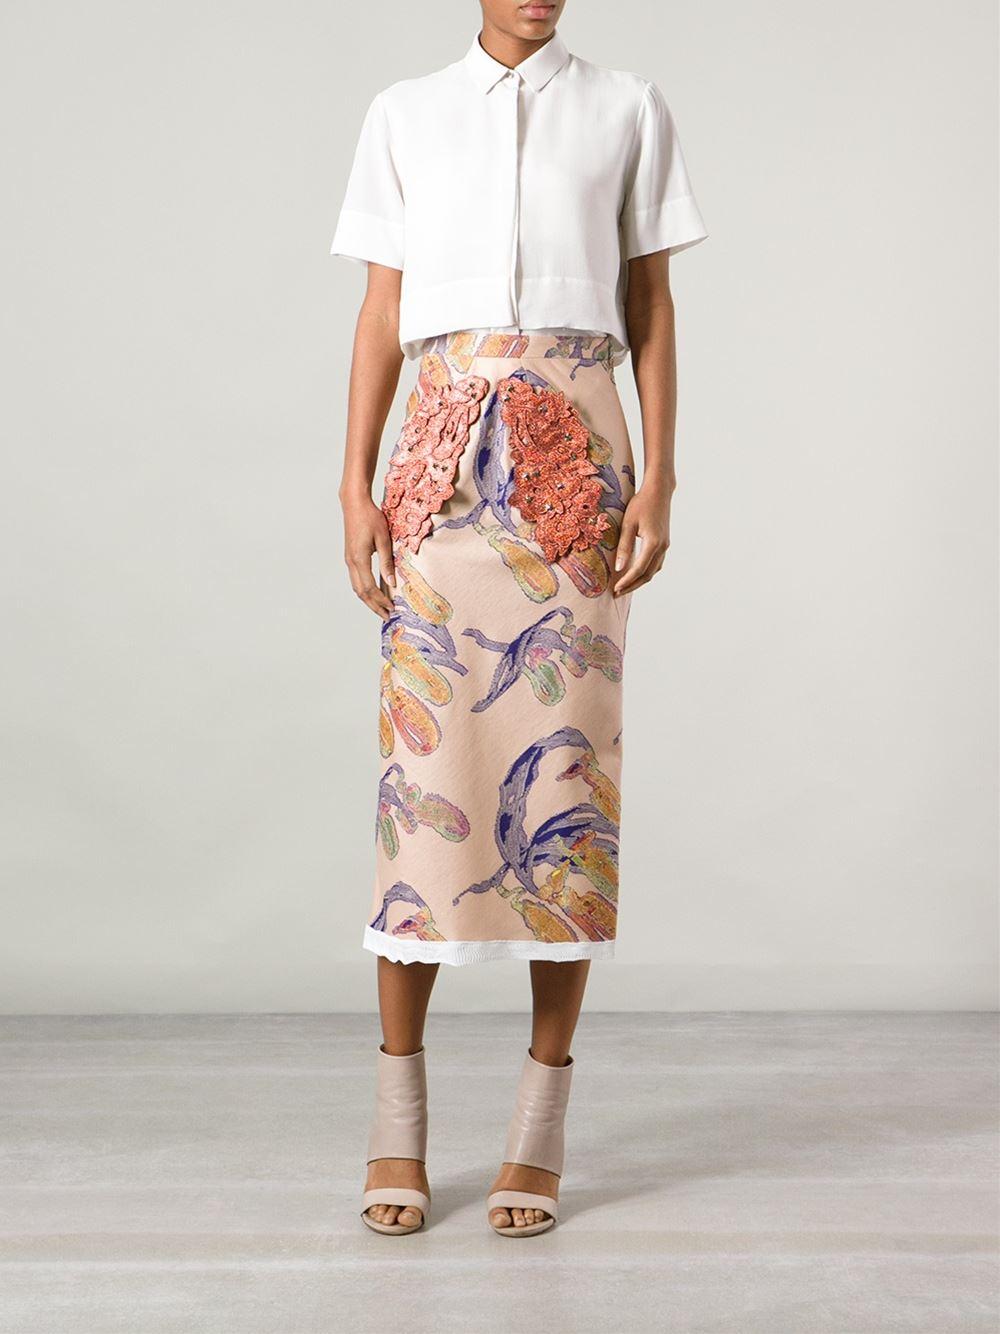 Sonia Rykiel Abstract Print Skirt - Jean Pierre Bua - Farfetch.com